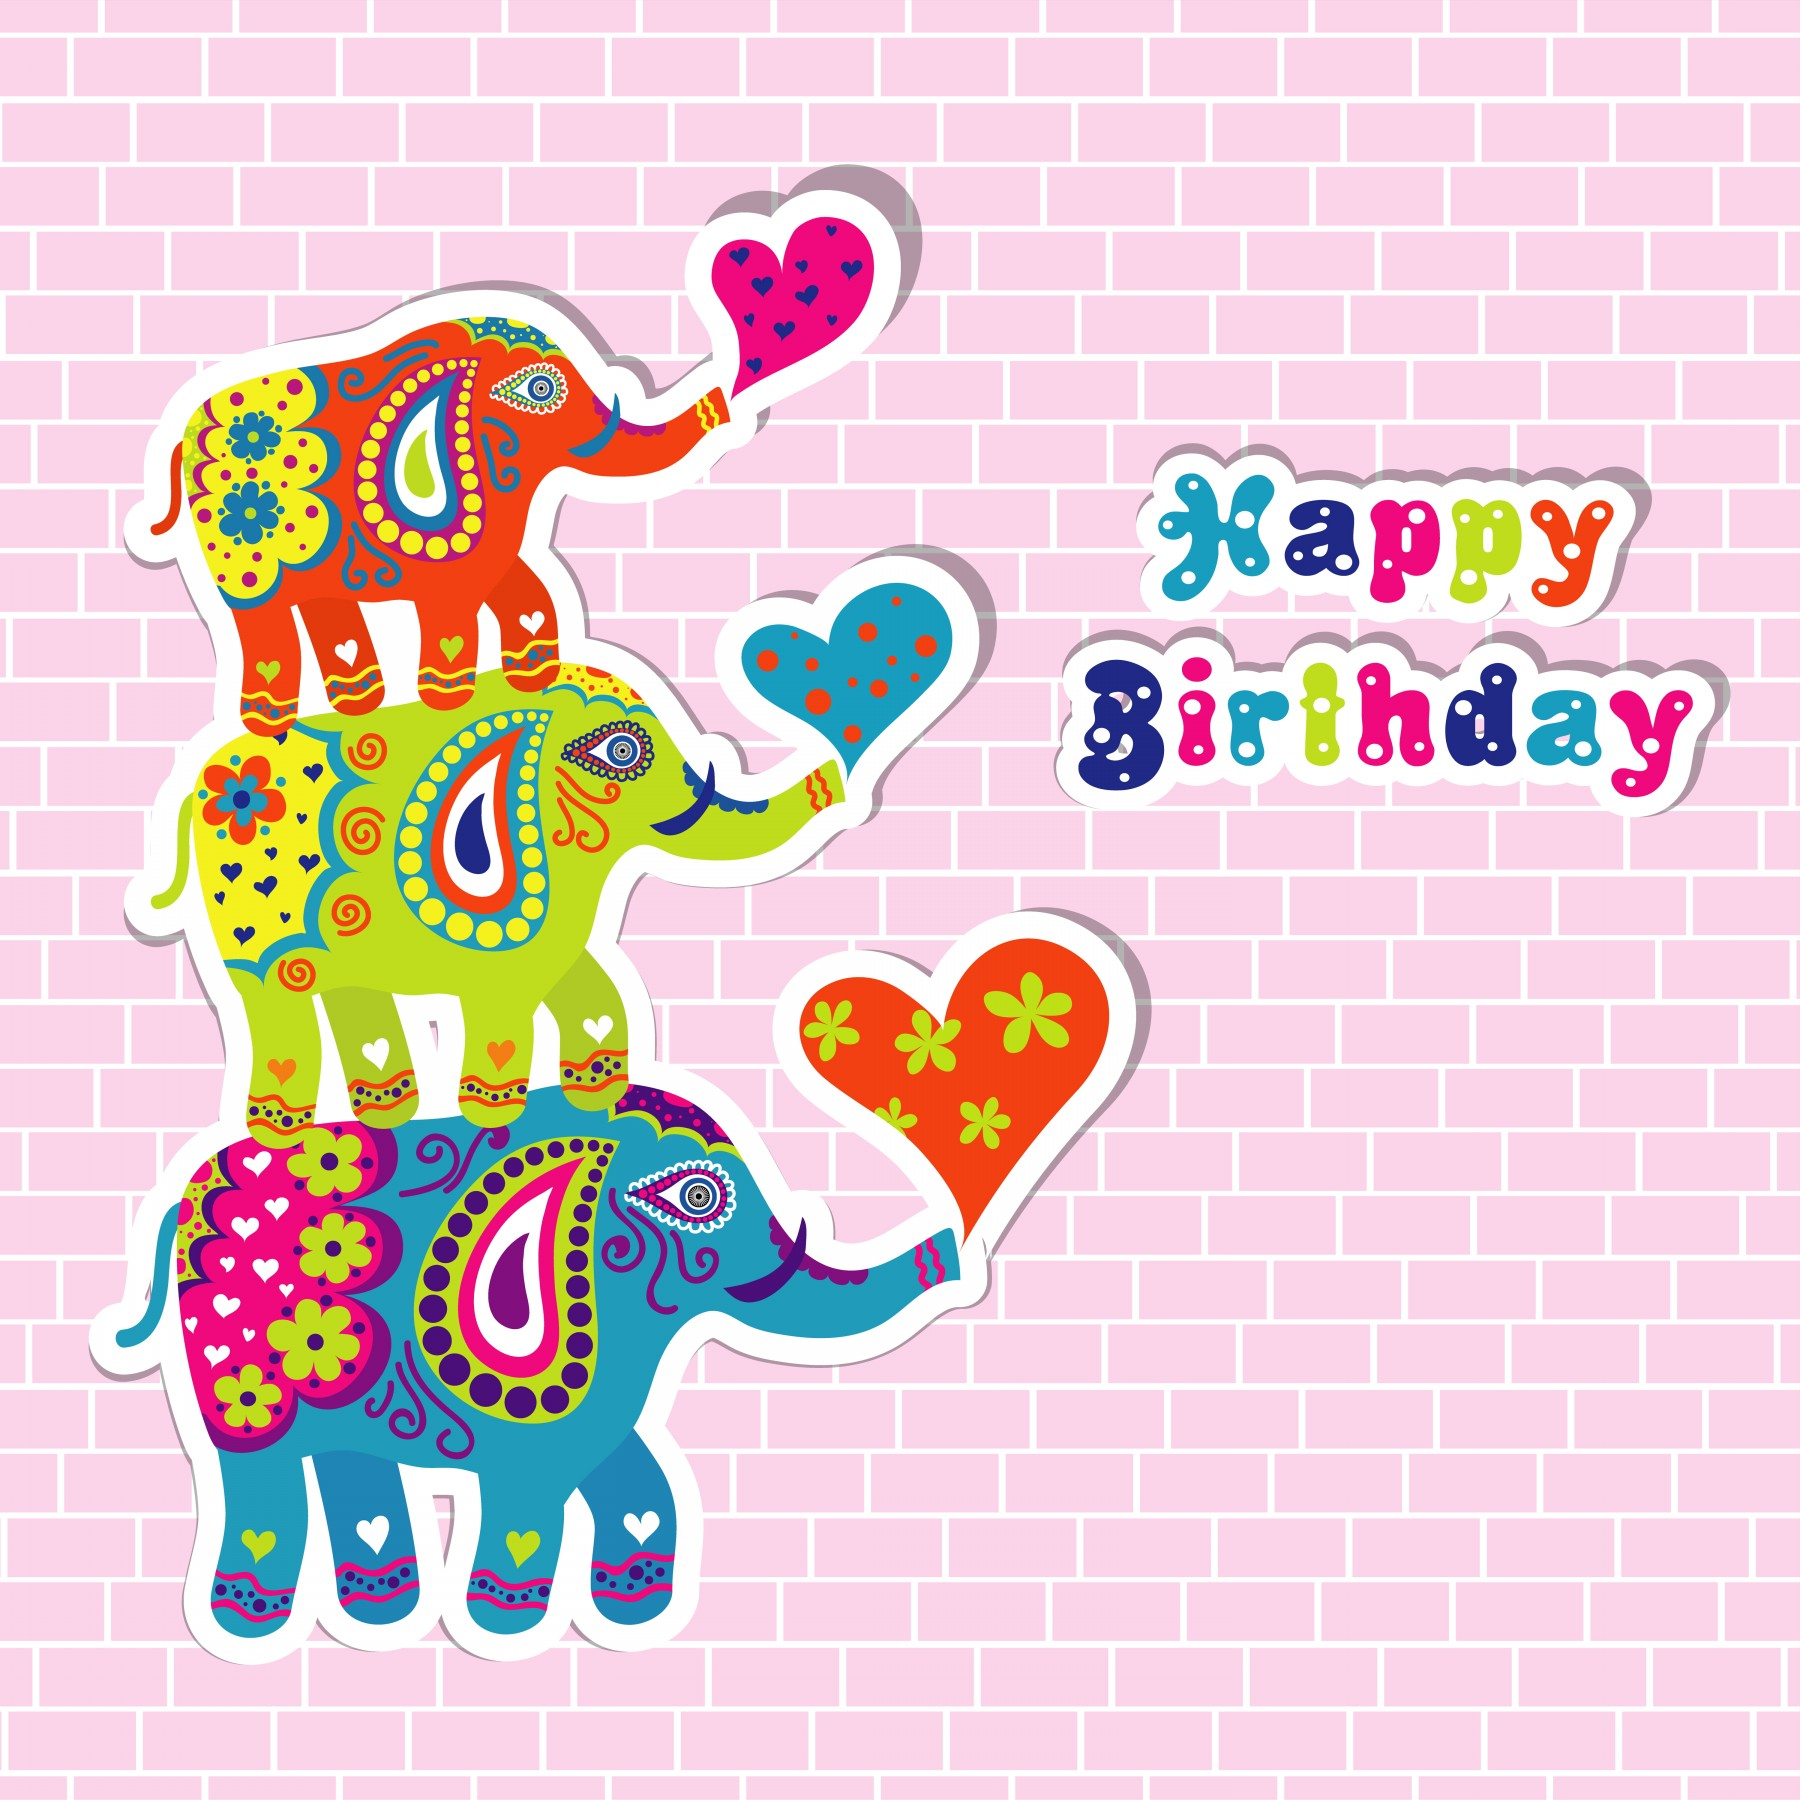 15 Happy Birthday Cards New Designs Elsoar